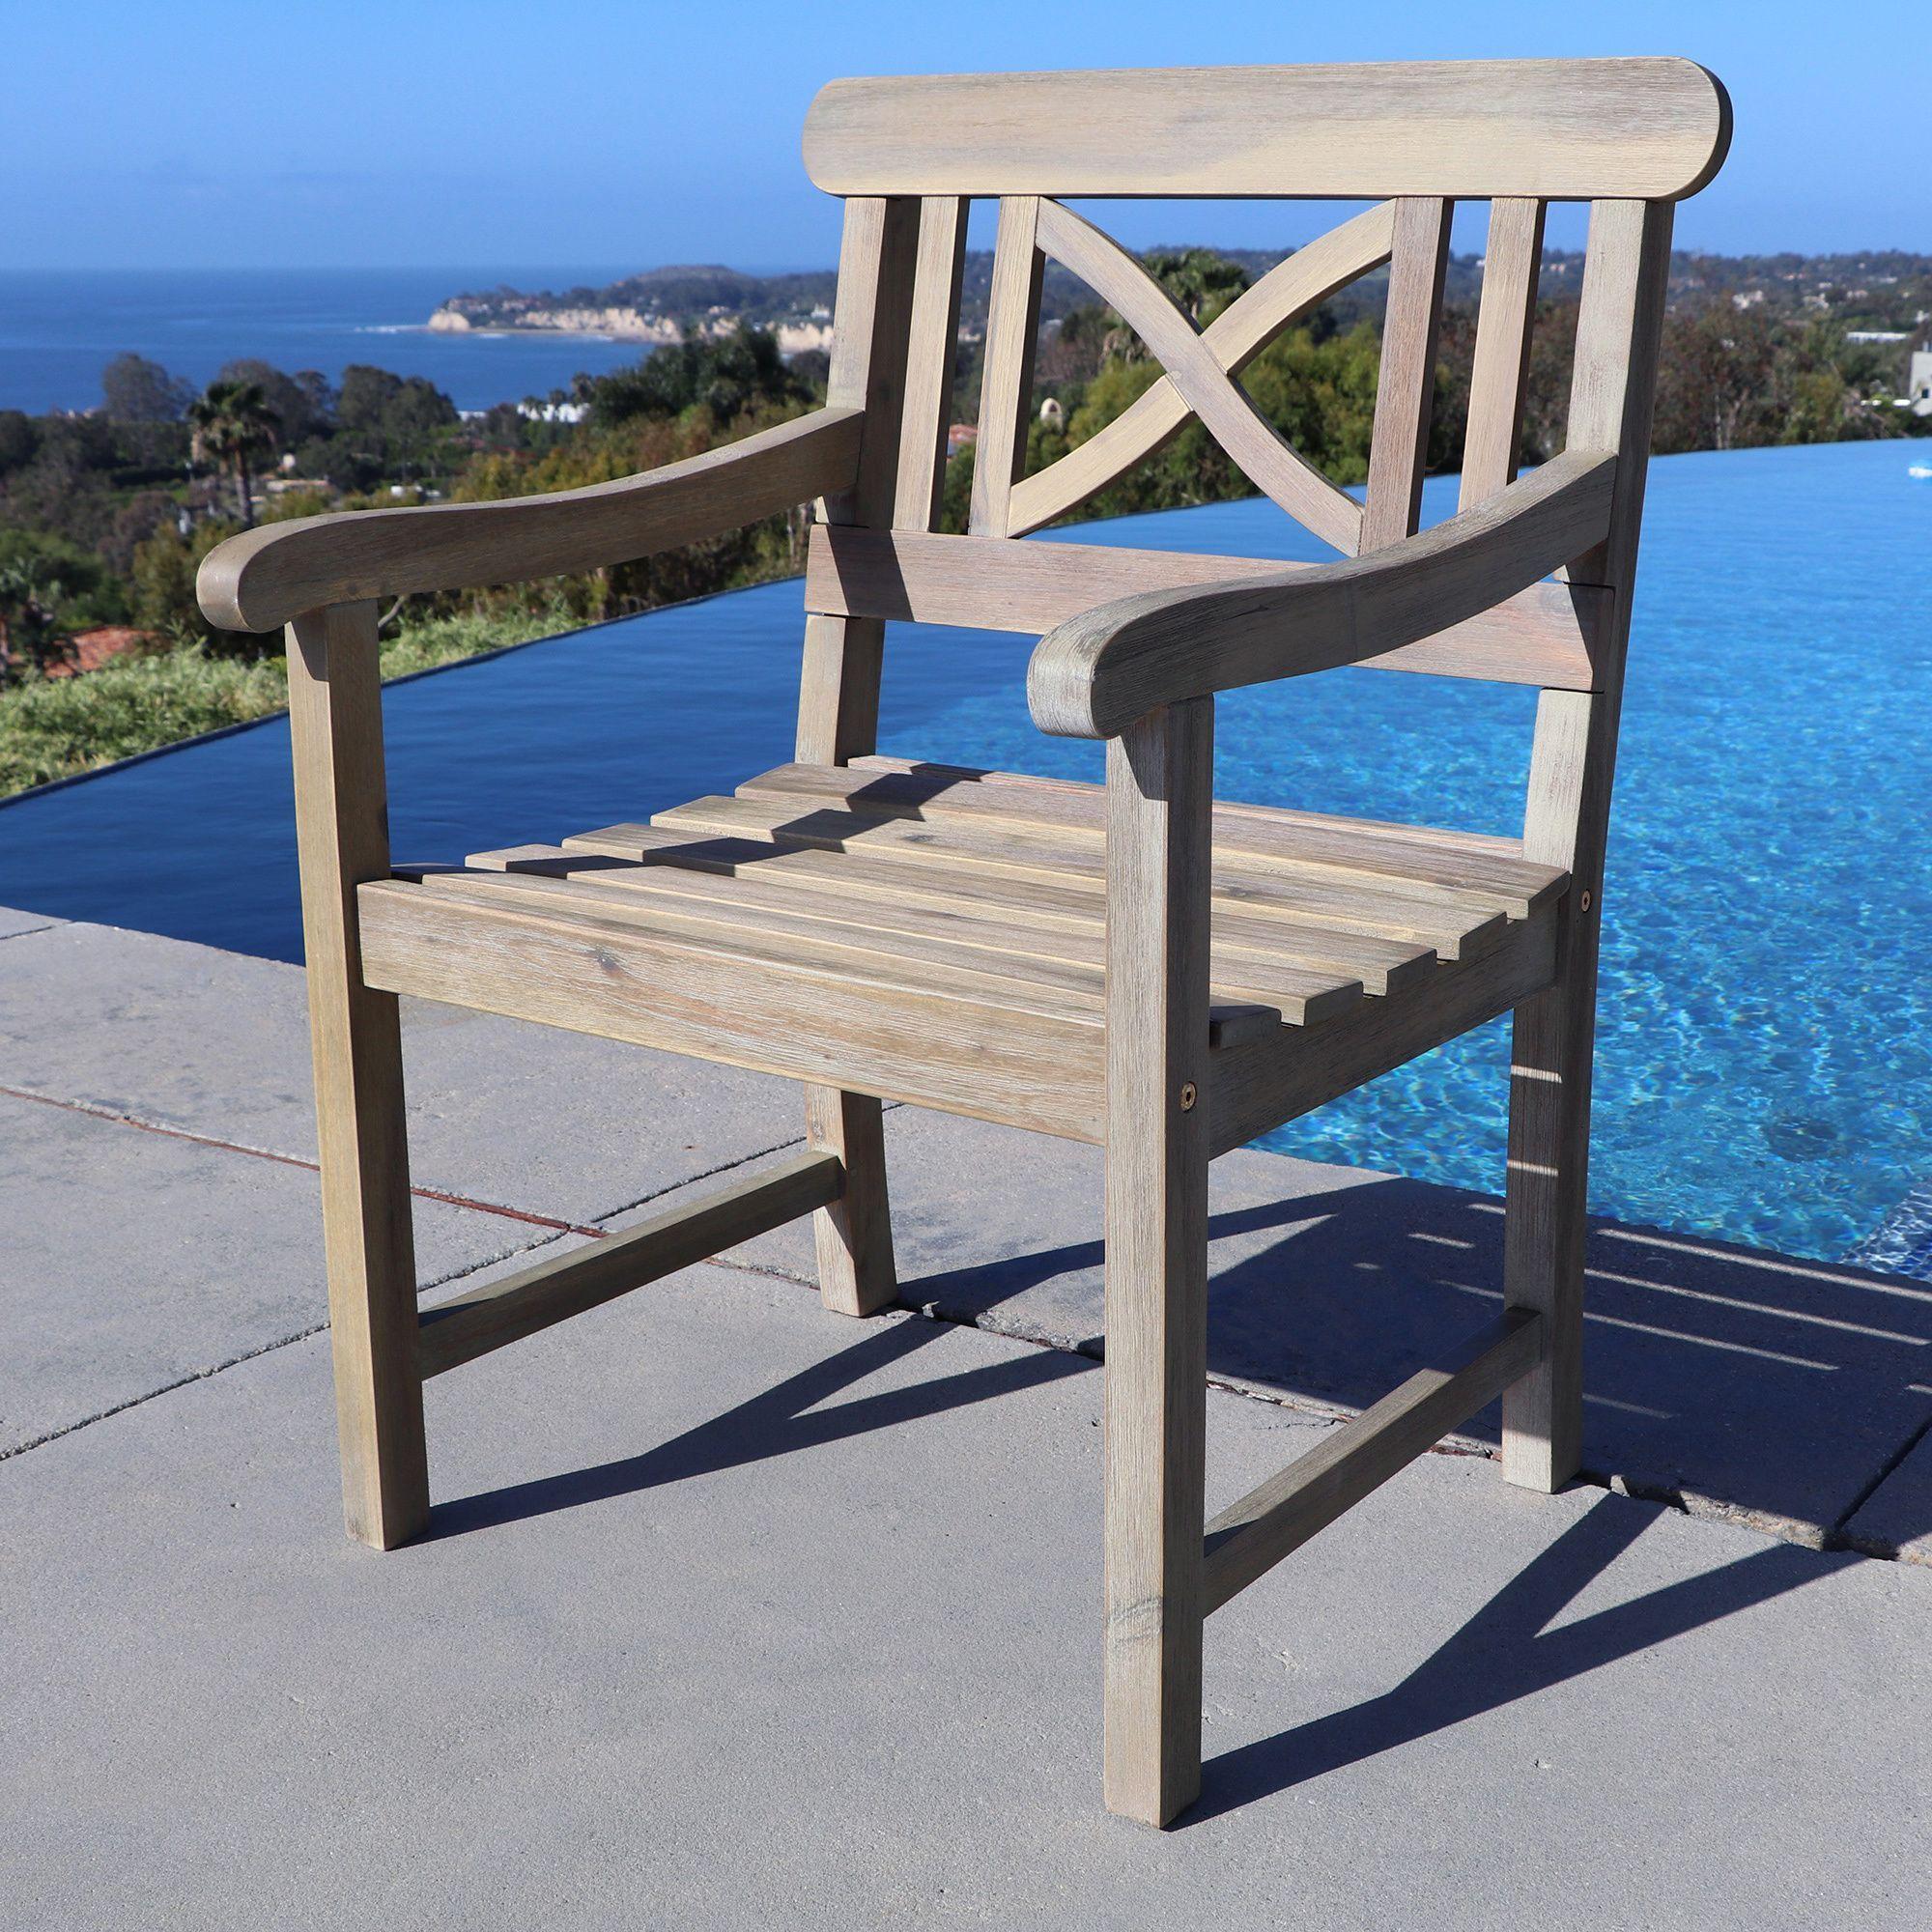 Vifah renaissance weather resistant outdoor hand scraped hardwood armchair outdoor furniture grey patio furniture